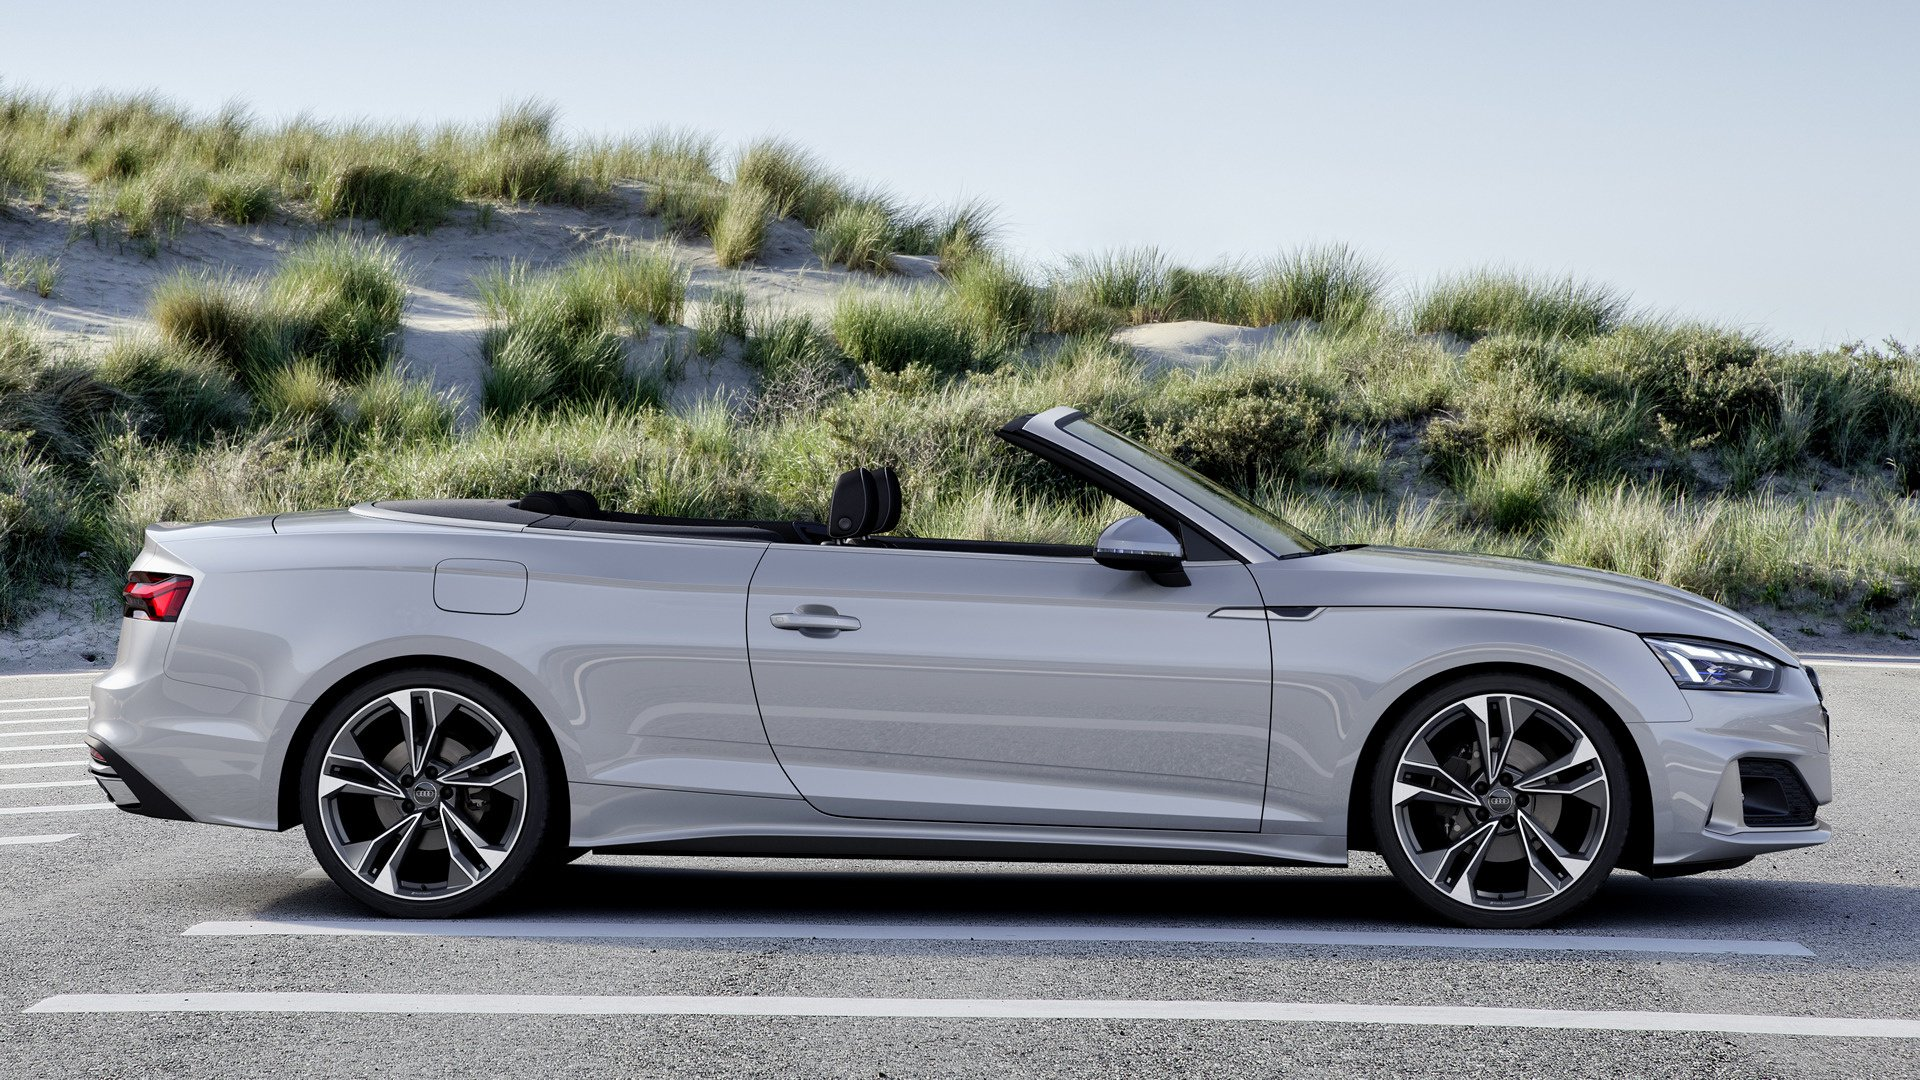 2020 Audi A5 Cabriolet Papel De Parede Hd Plano De Fundo 1920x1080 Id 1040830 Wallpaper Abyss